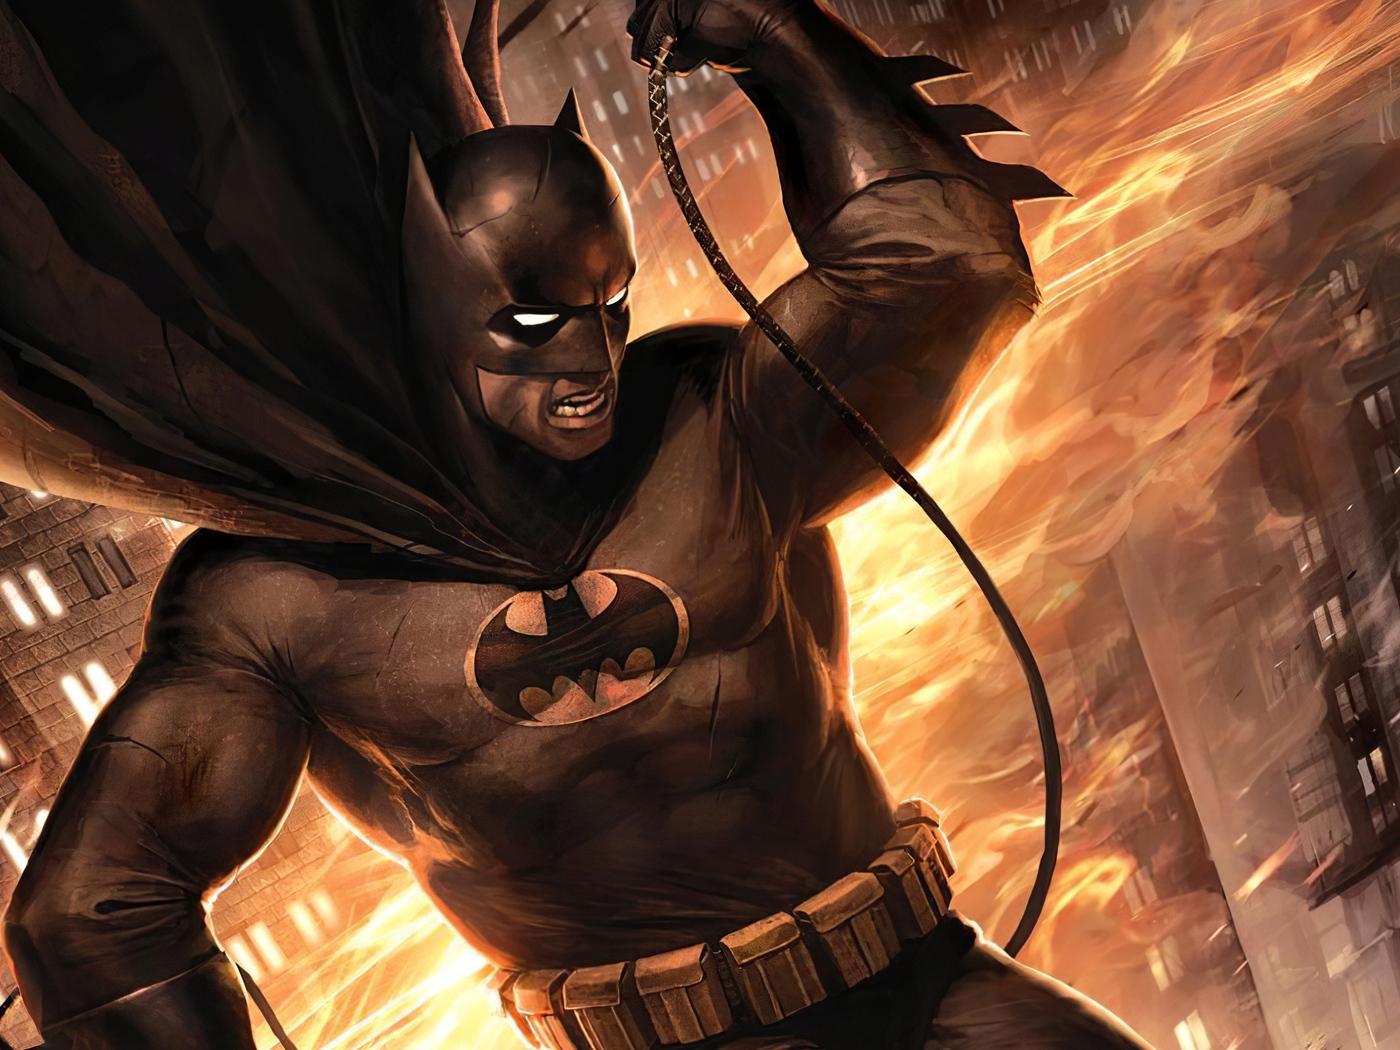 batman-the-dark-knight-returns-artwork-9b.jpg